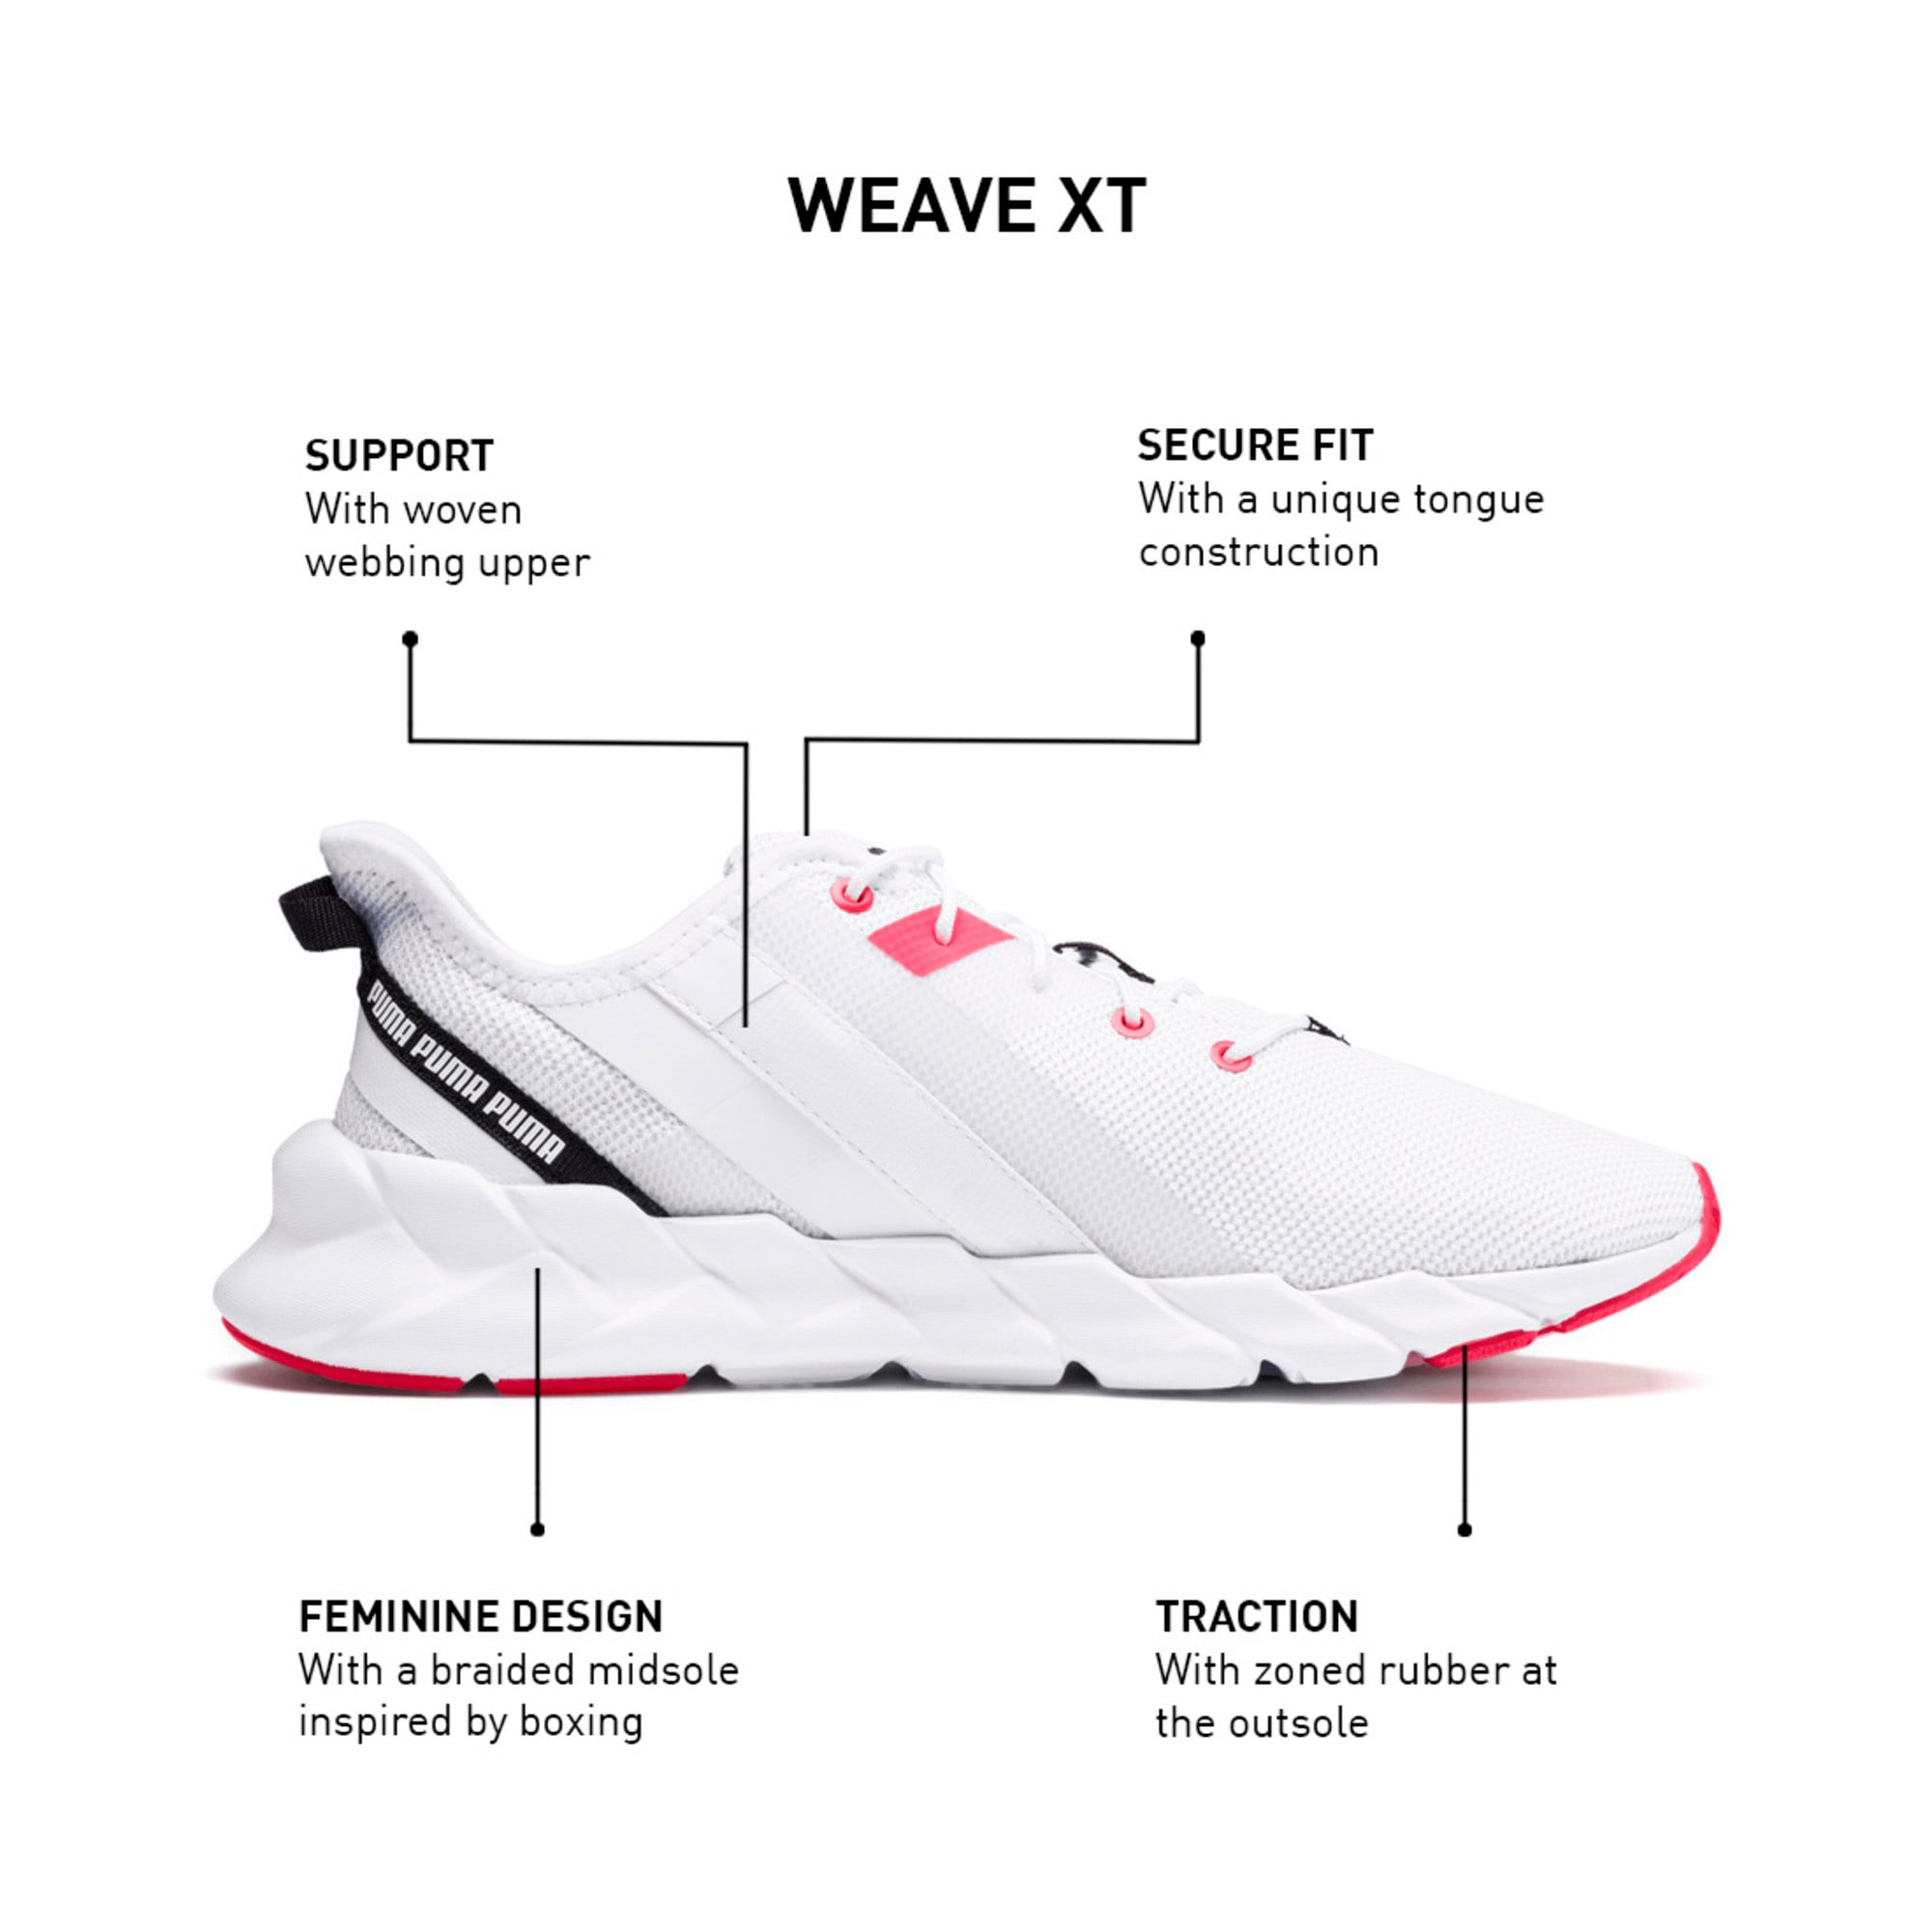 Thumbnail 11 of Weave XT Women's Training Shoes, Puma White-Pink Alert, medium-IND